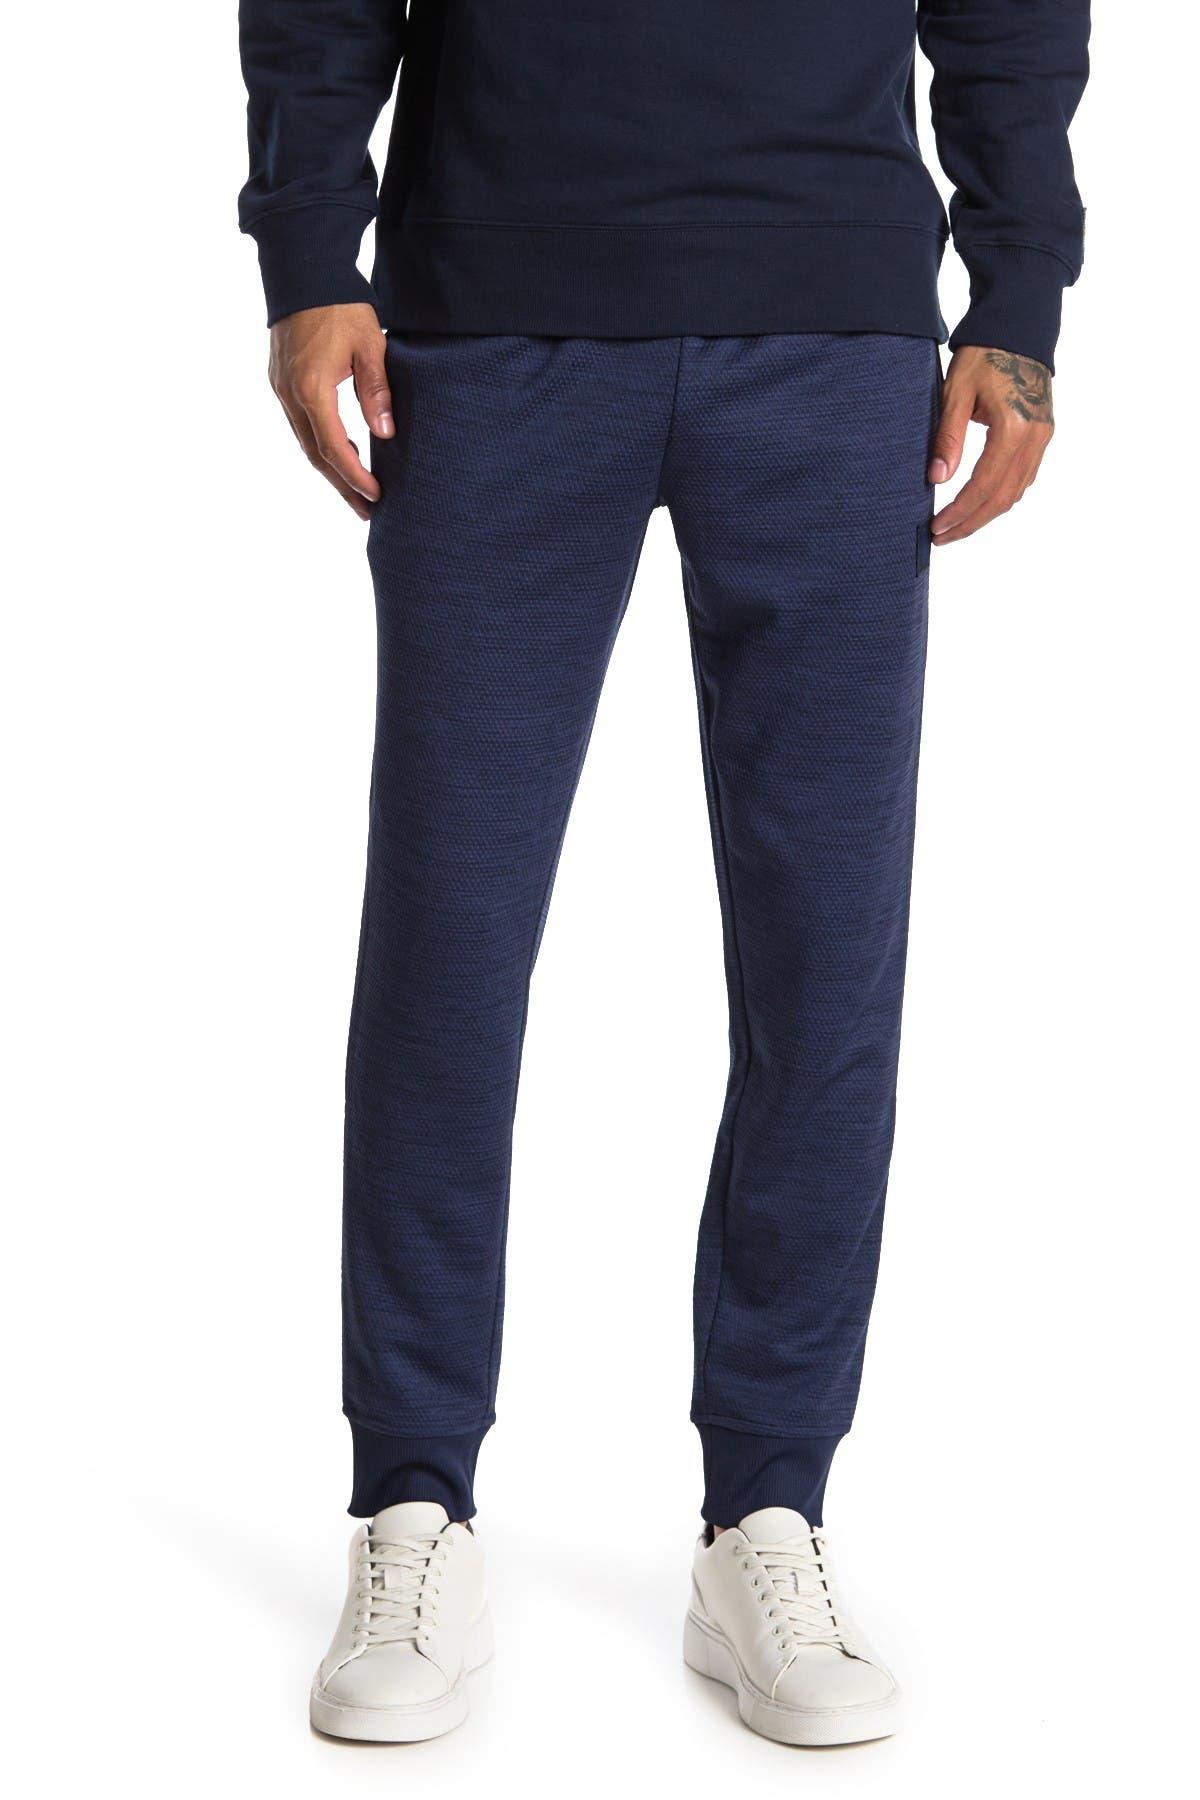 Image of K-Swiss Precision Fleece Pants